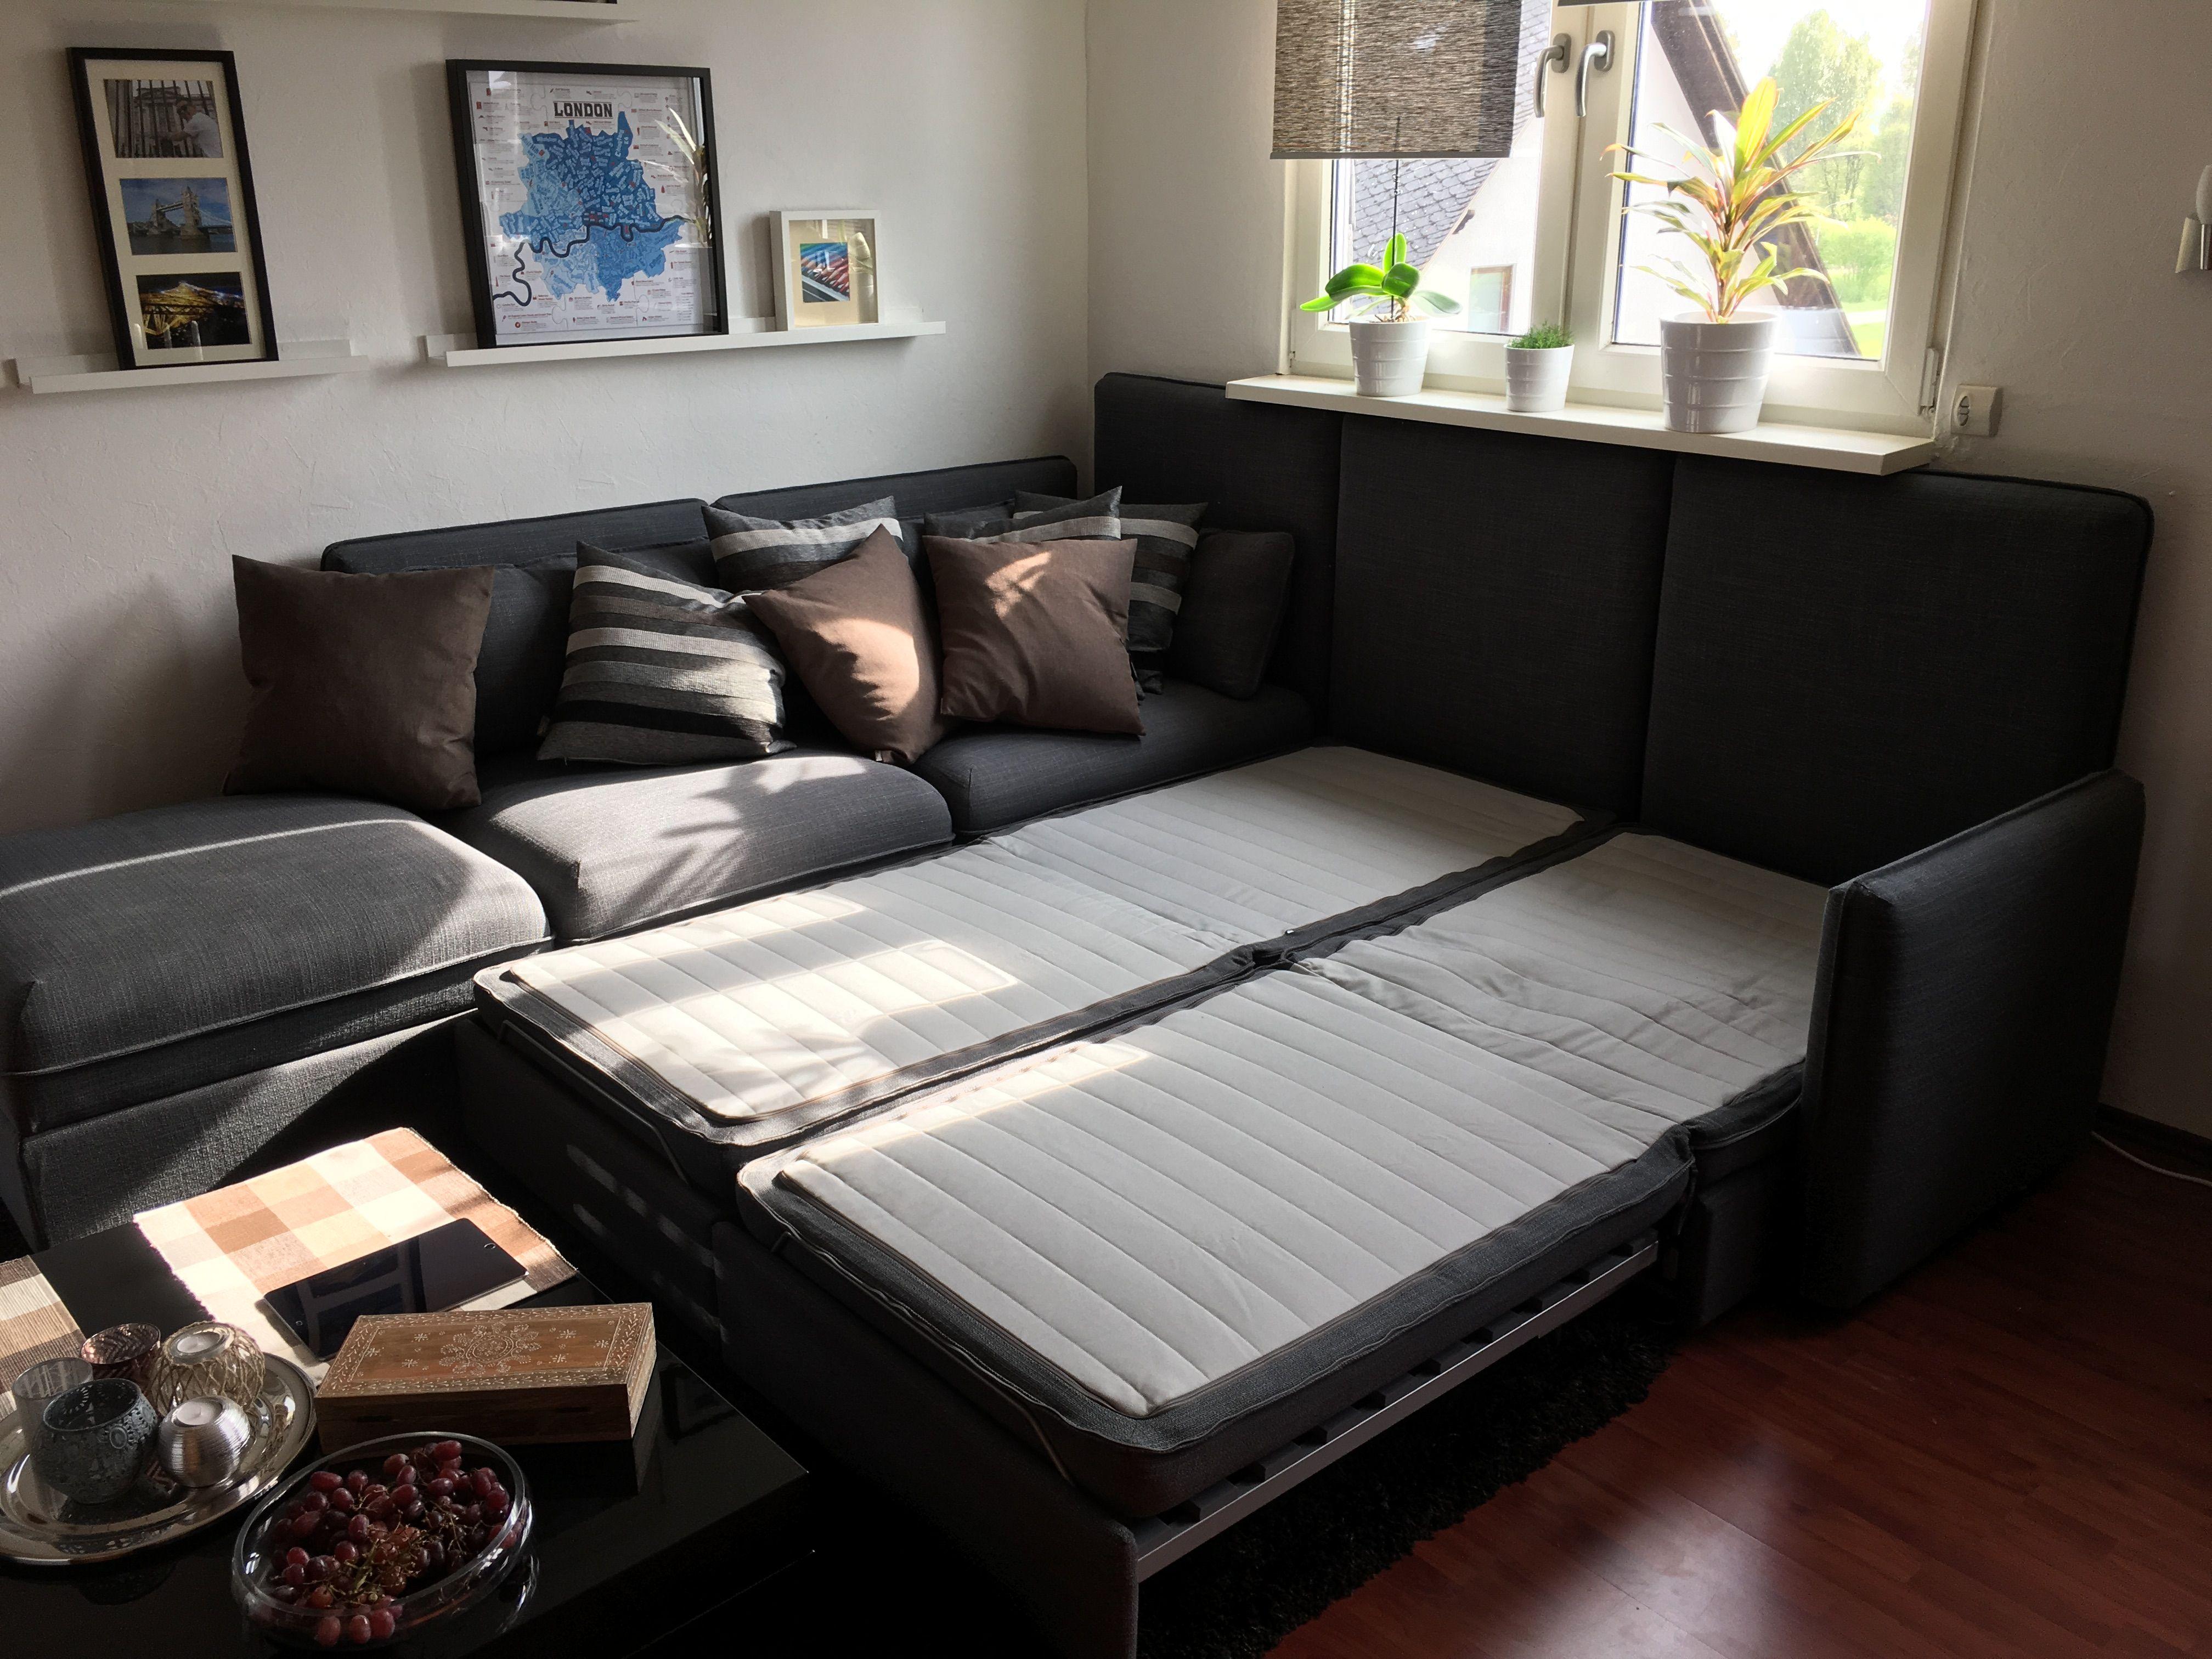 Ikea Vallentuna House New Room Ideas In 2019 Sofa Sofa Bed Ikea